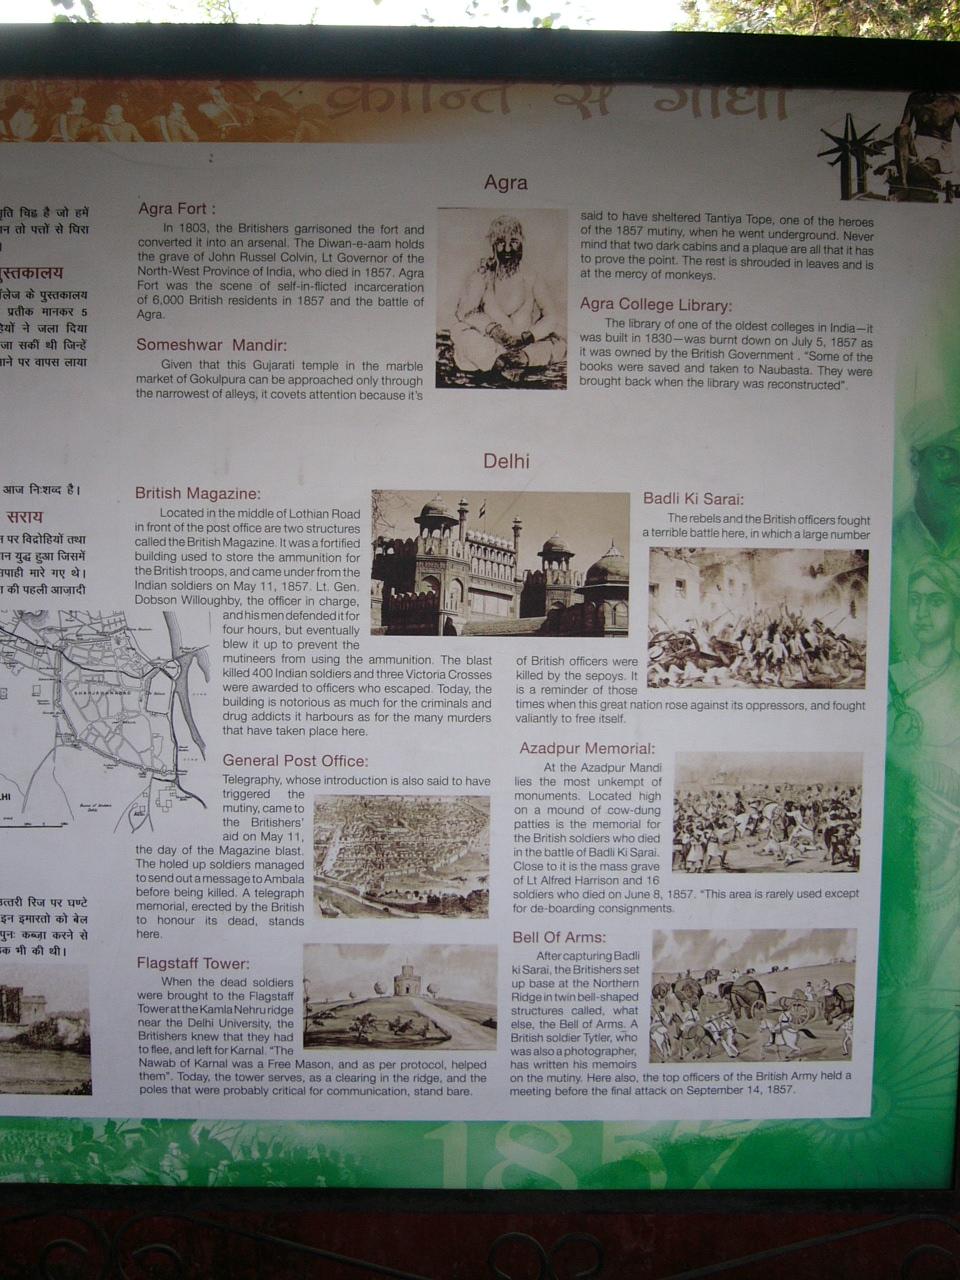 New Dehli: Mahatama Ghandi memorial | Nyiwin's Blog